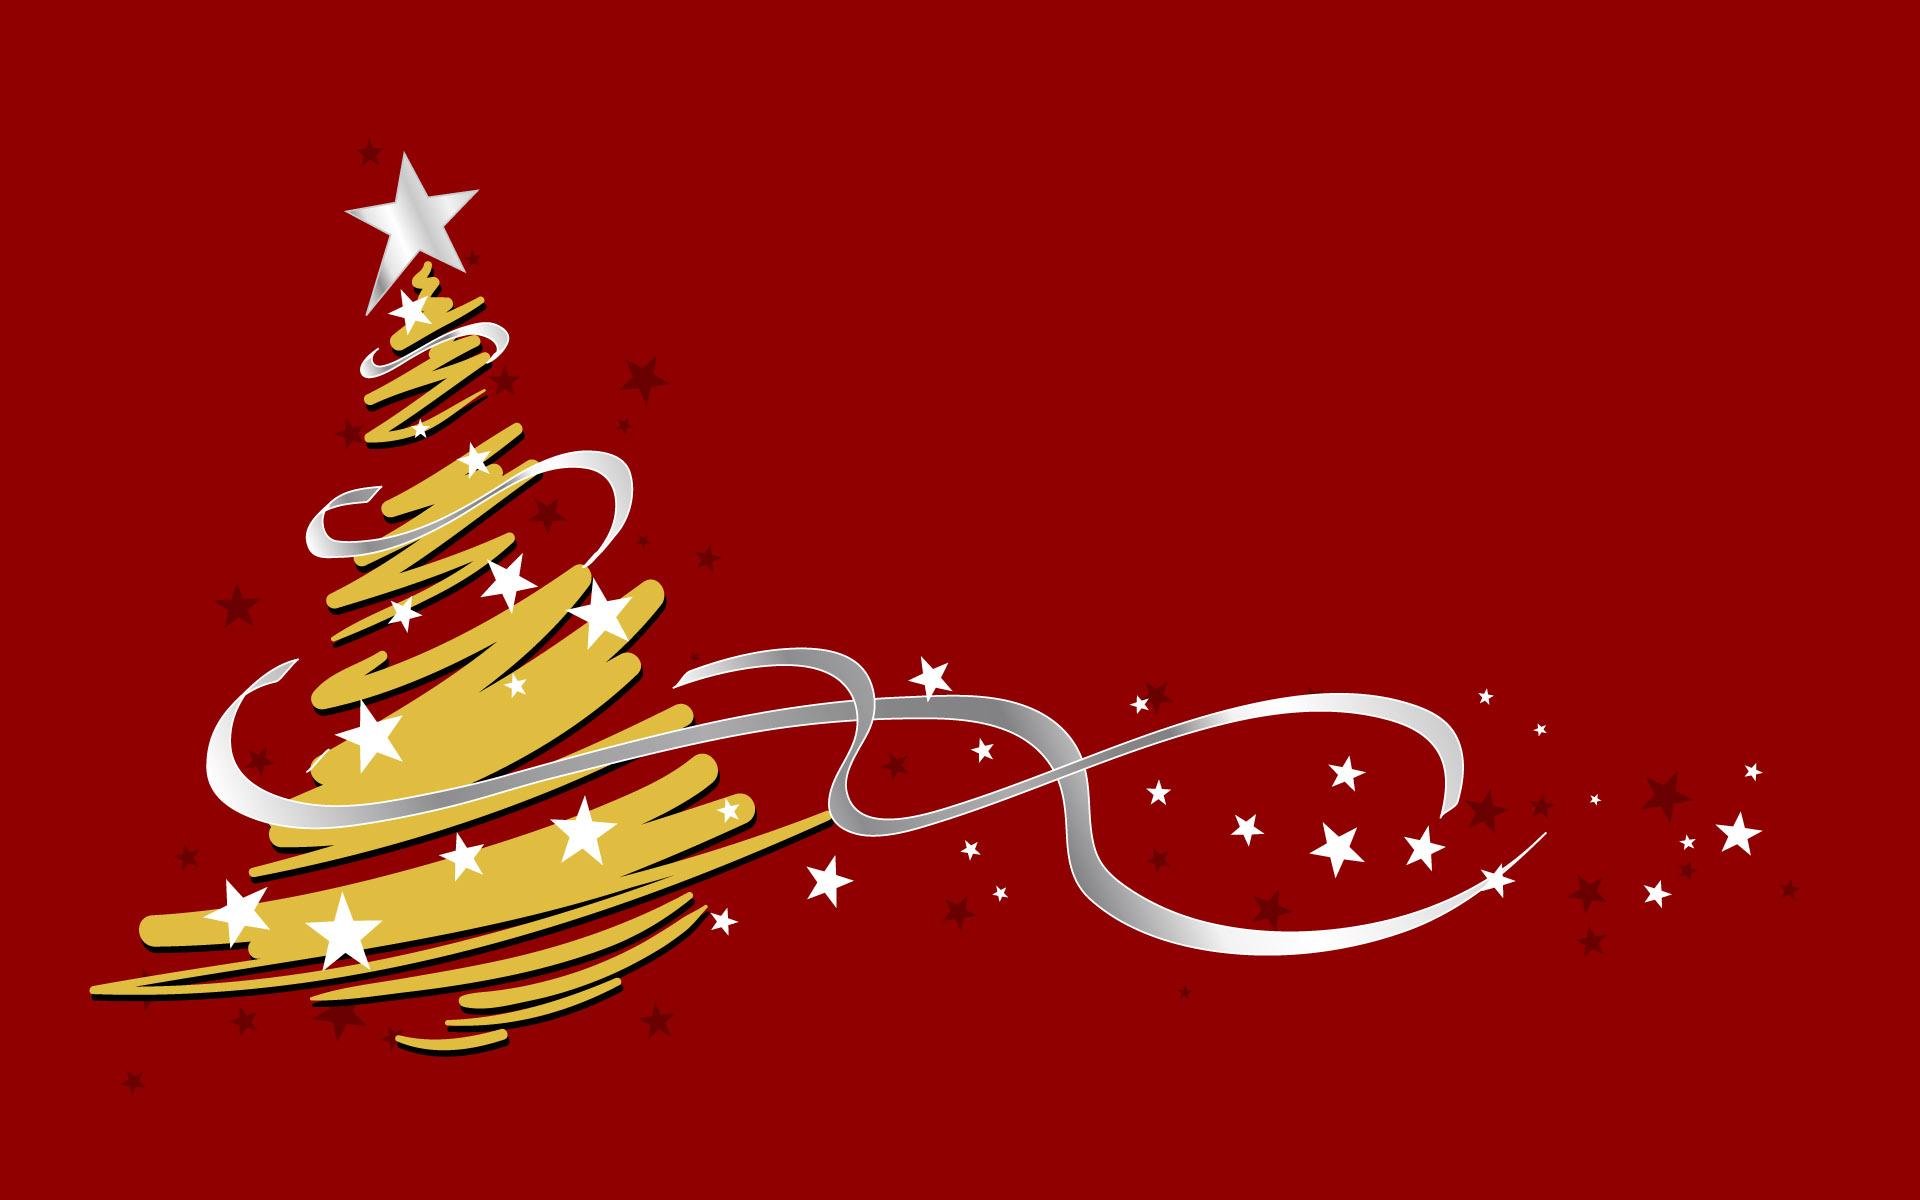 Biglietti Di Natale Email.Immagini Natale Per Email Disegni Di Natale 2019